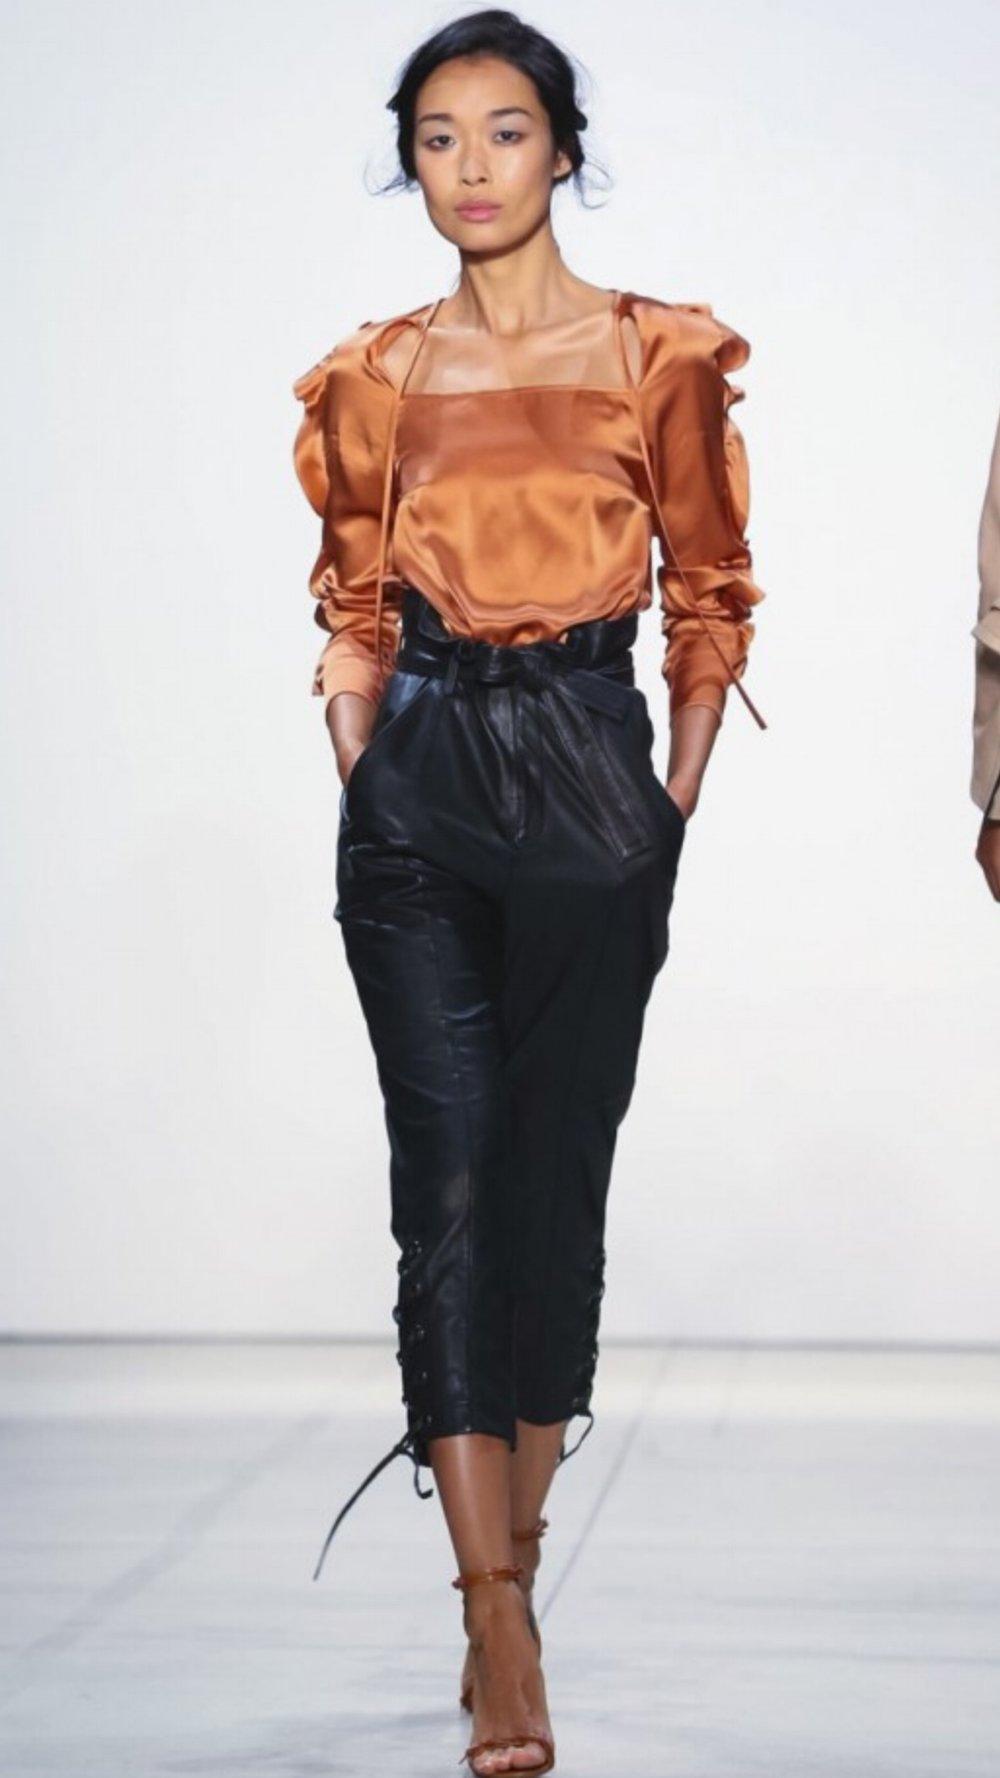 Marissa-Webb-NYFW-2016-Runway-Lucys-Whims-Fashion-Blogger.jpg